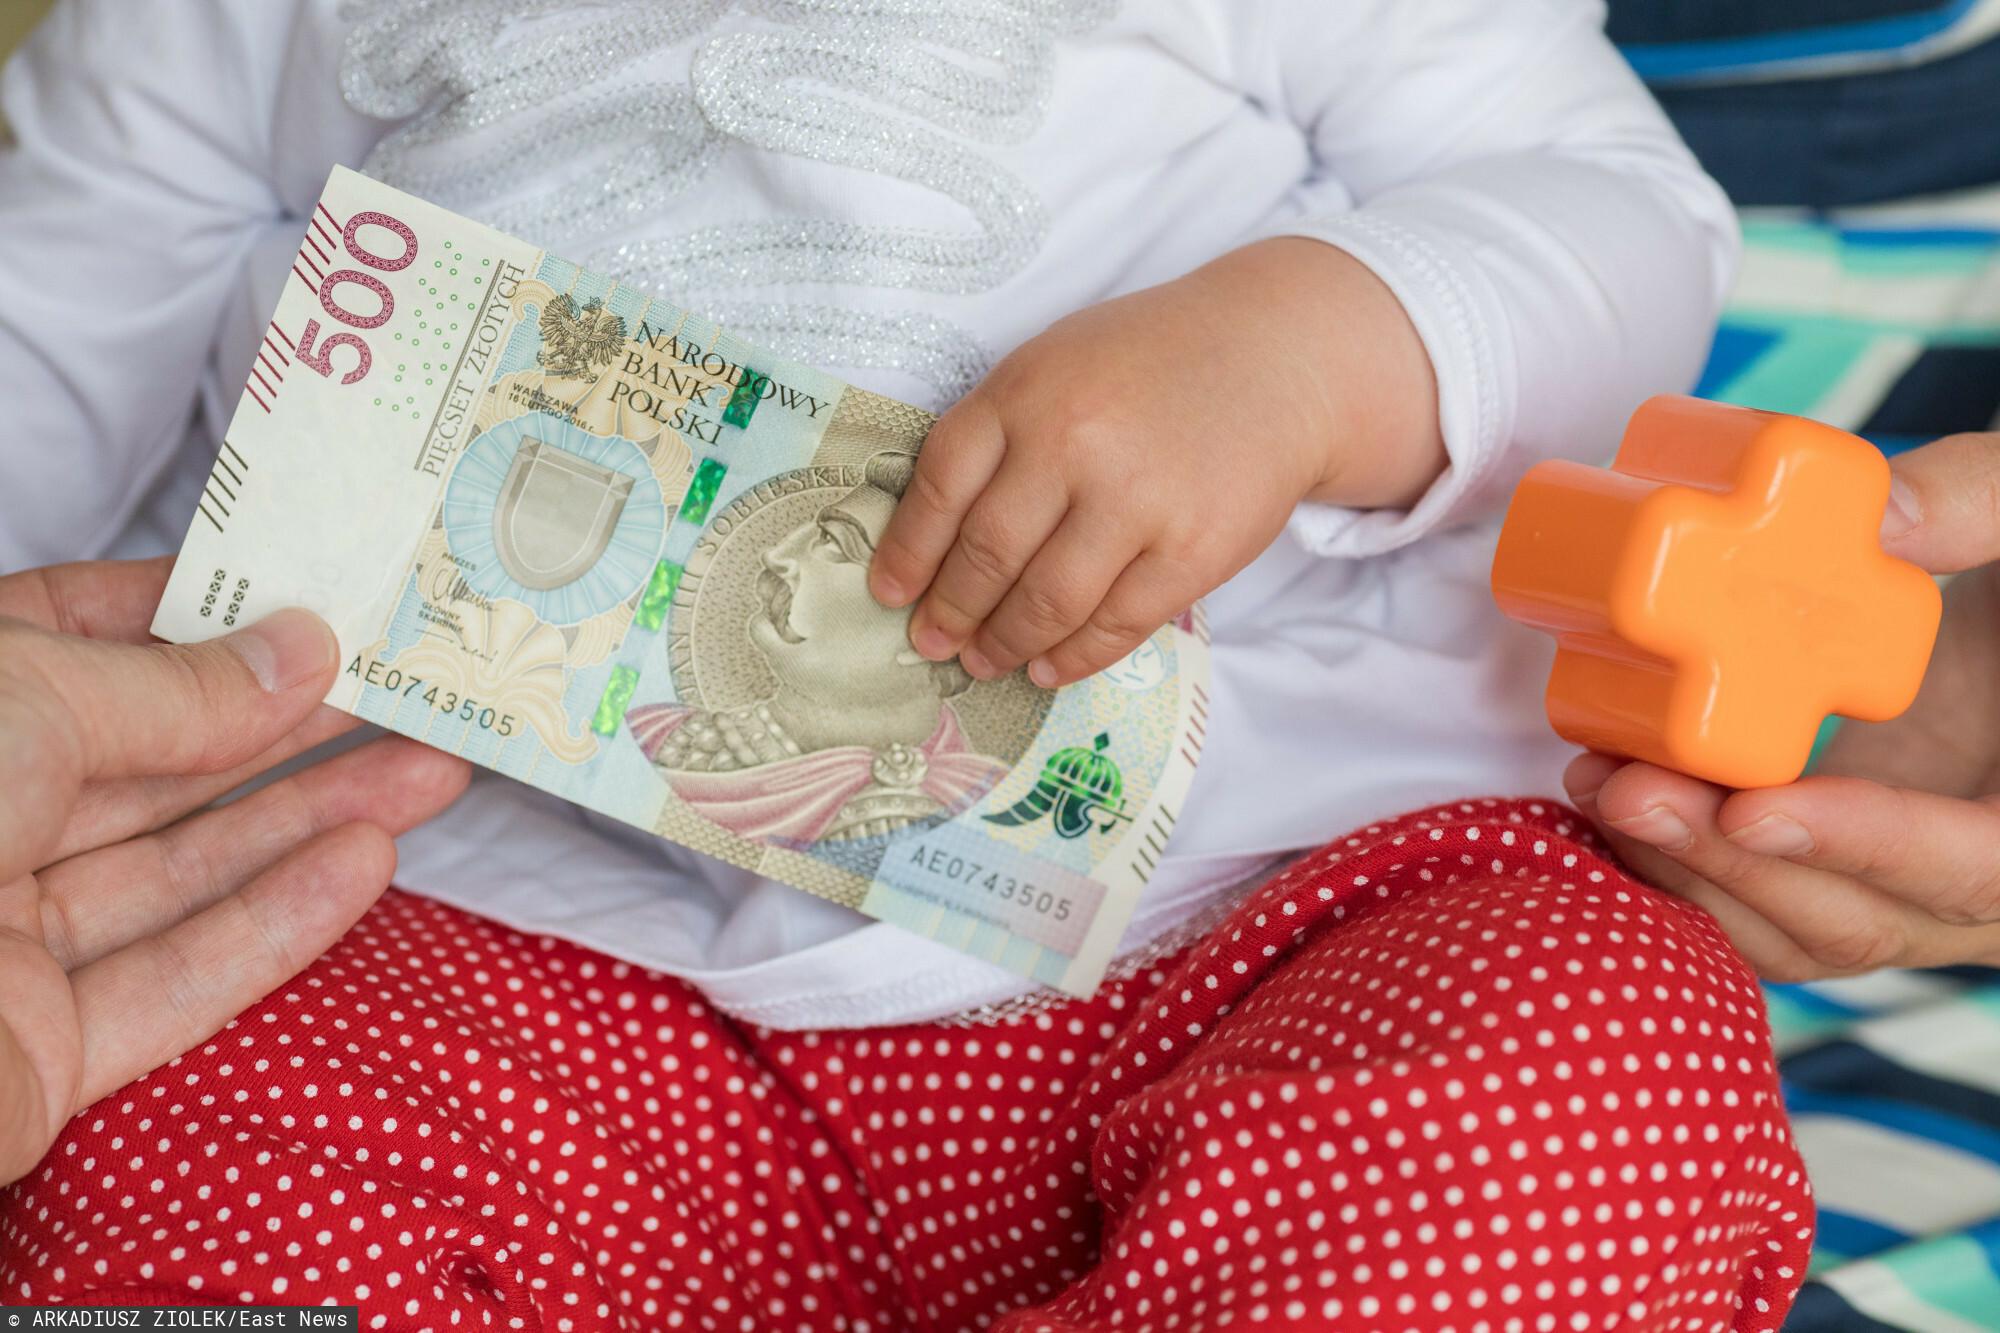 fot: Arkadiusz Ziolek/ East News. 16.07.2019. n/z Dlon dziecka i matki na tle zabawek i banknotu 500 zl.